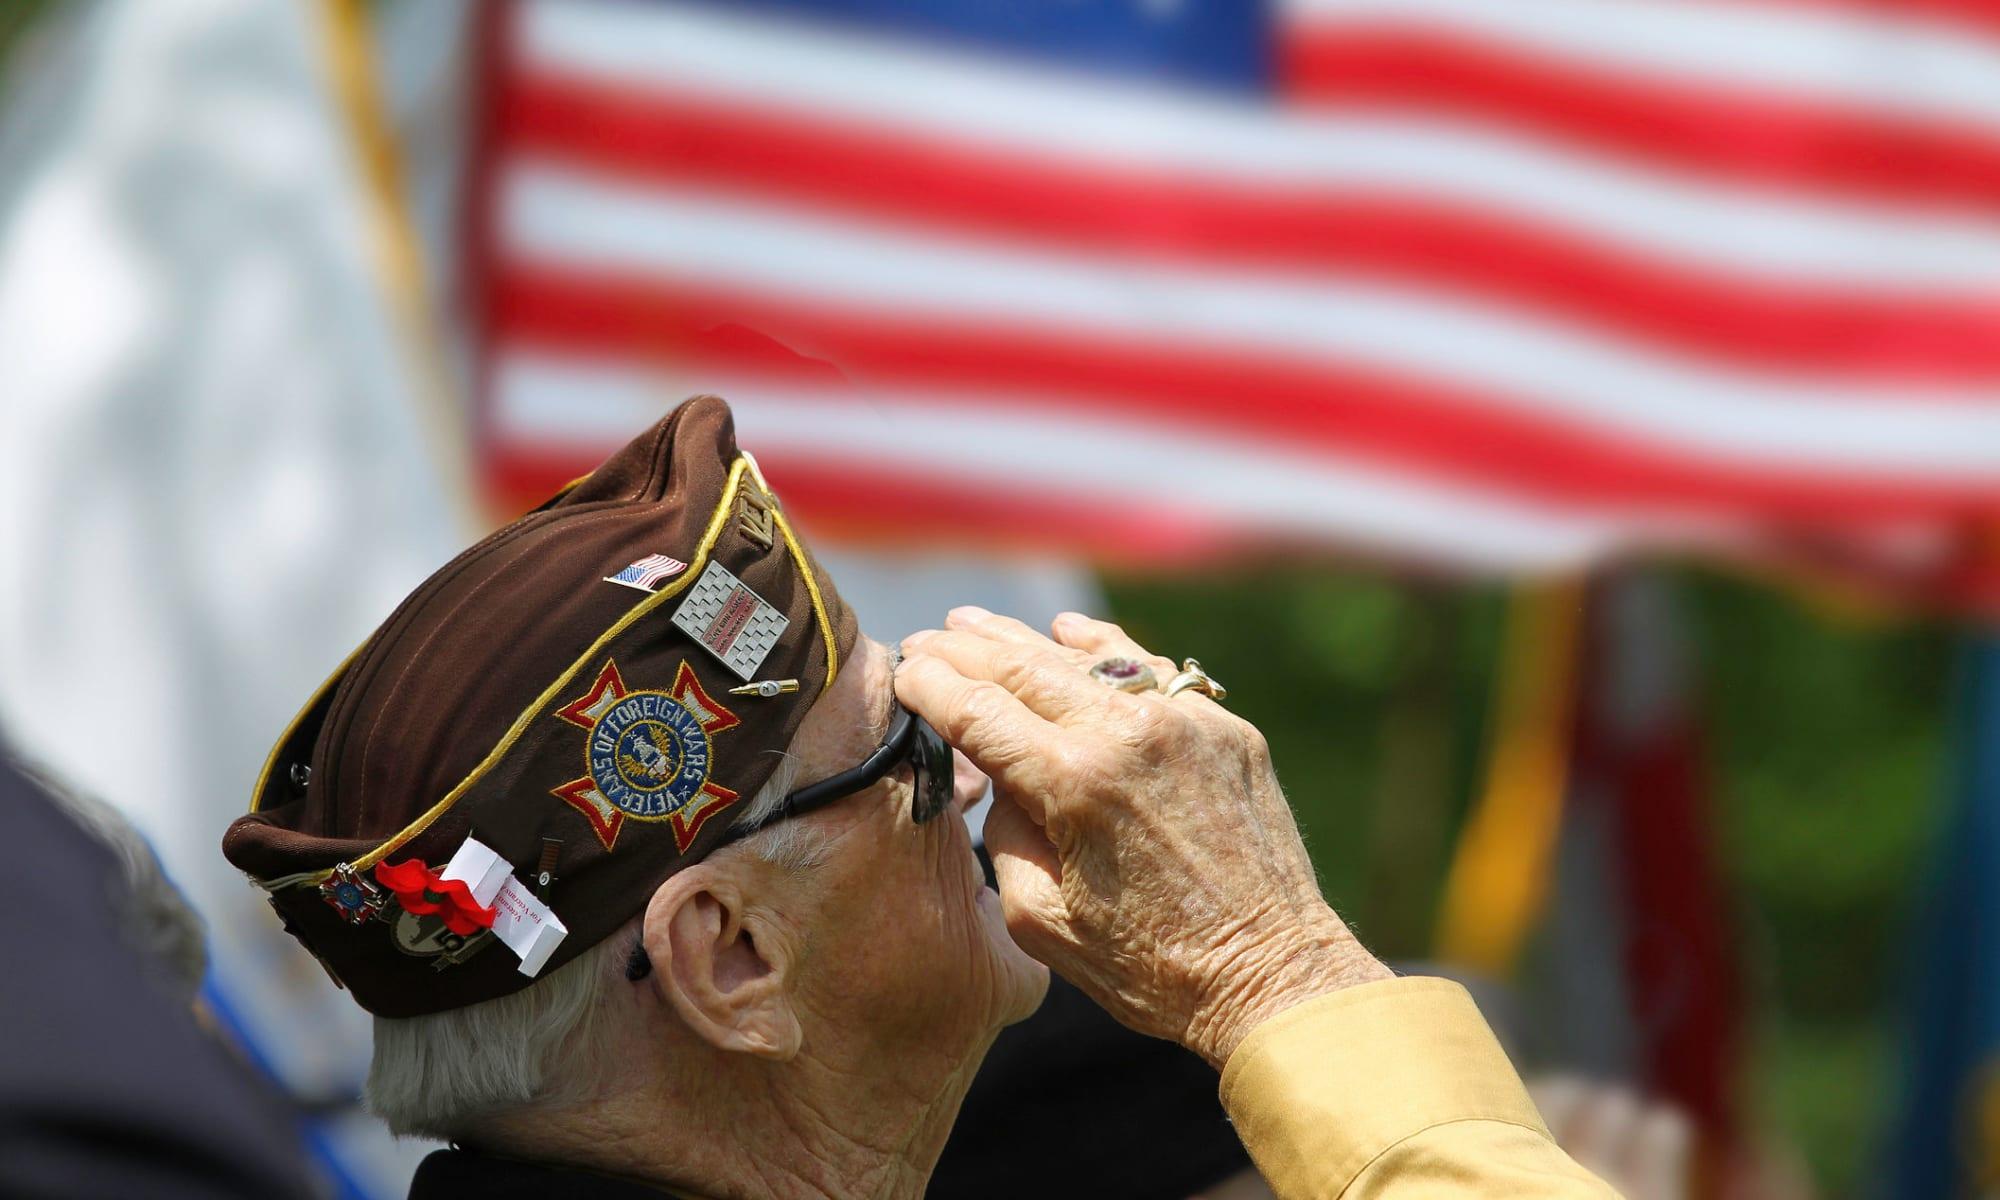 A veteran salutes the flag at Broadwell Senior Living in Kearney, Nebraska